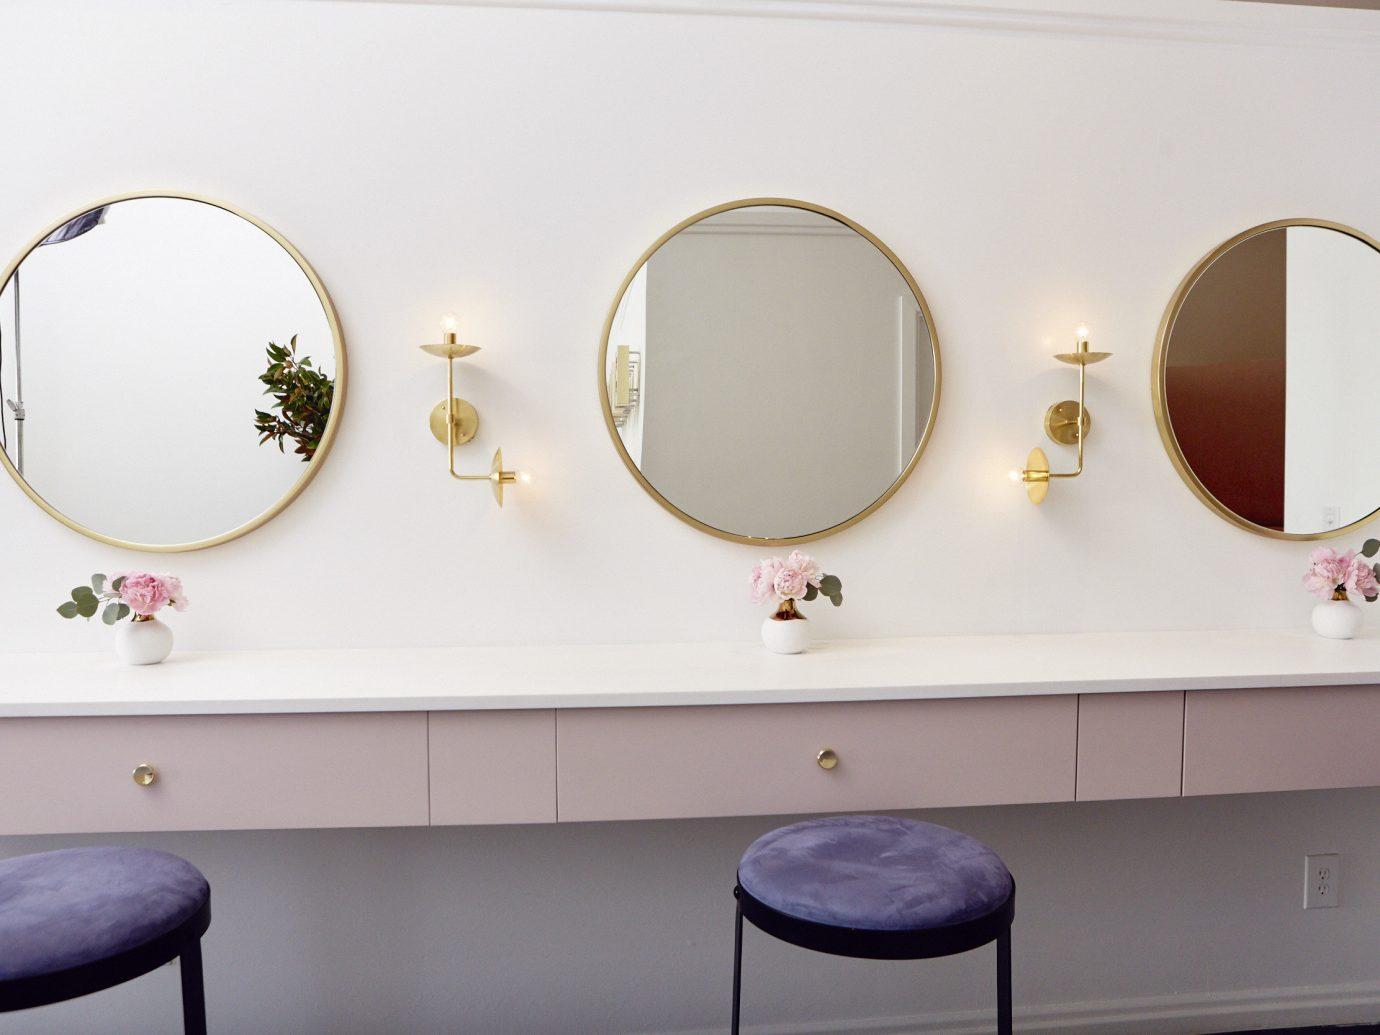 Offbeat wall indoor color room circle interior design shape glasses Design